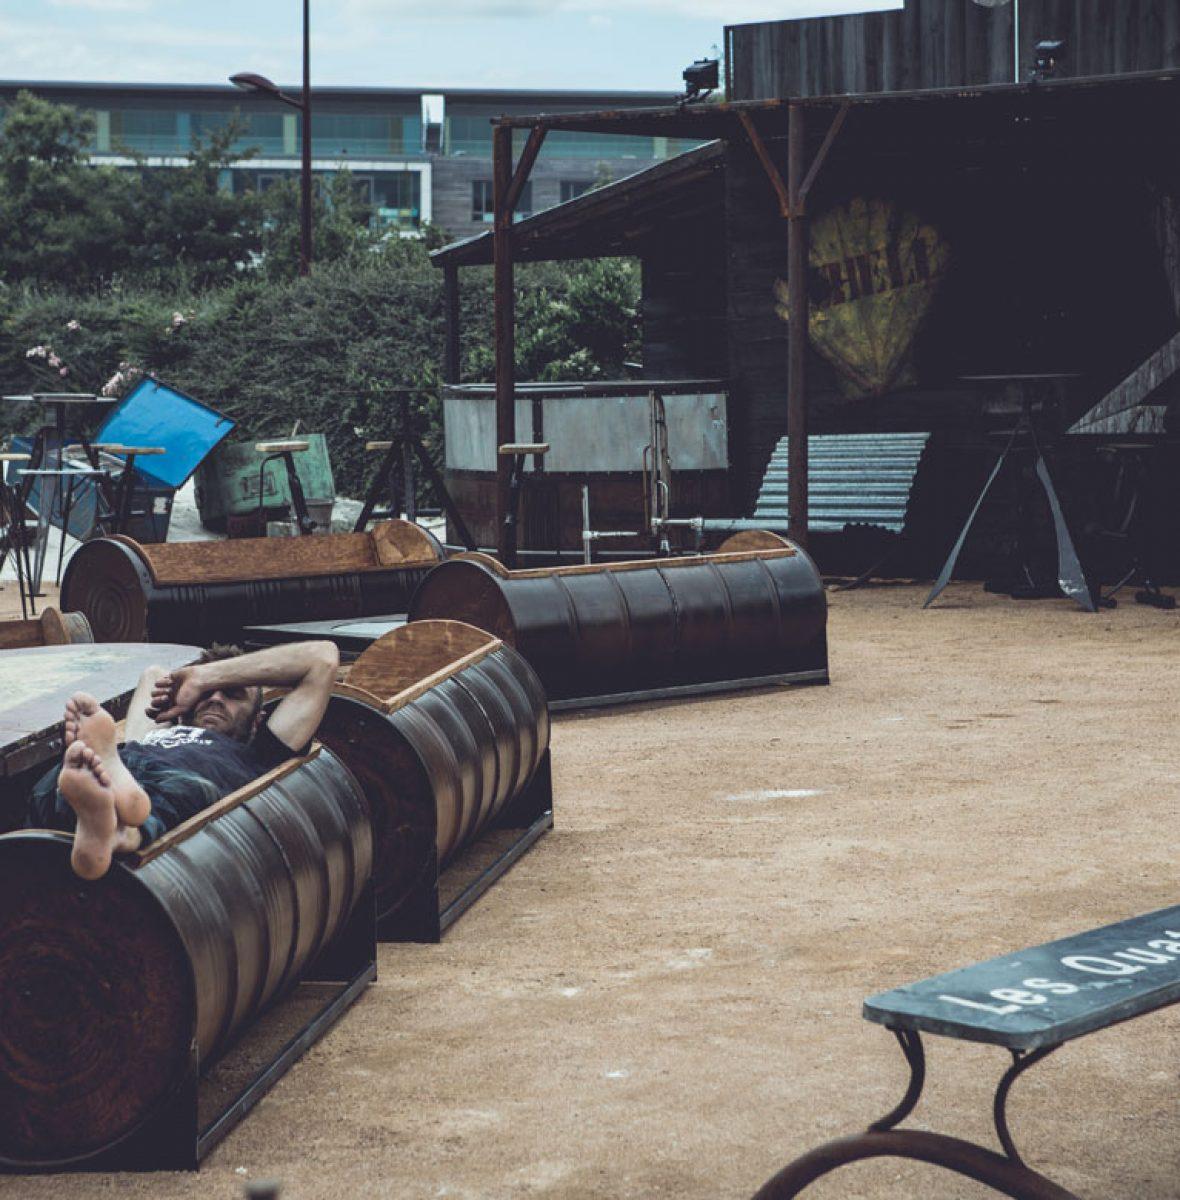 BANCS-MADNEOM-VIP-HELLFEST-2015